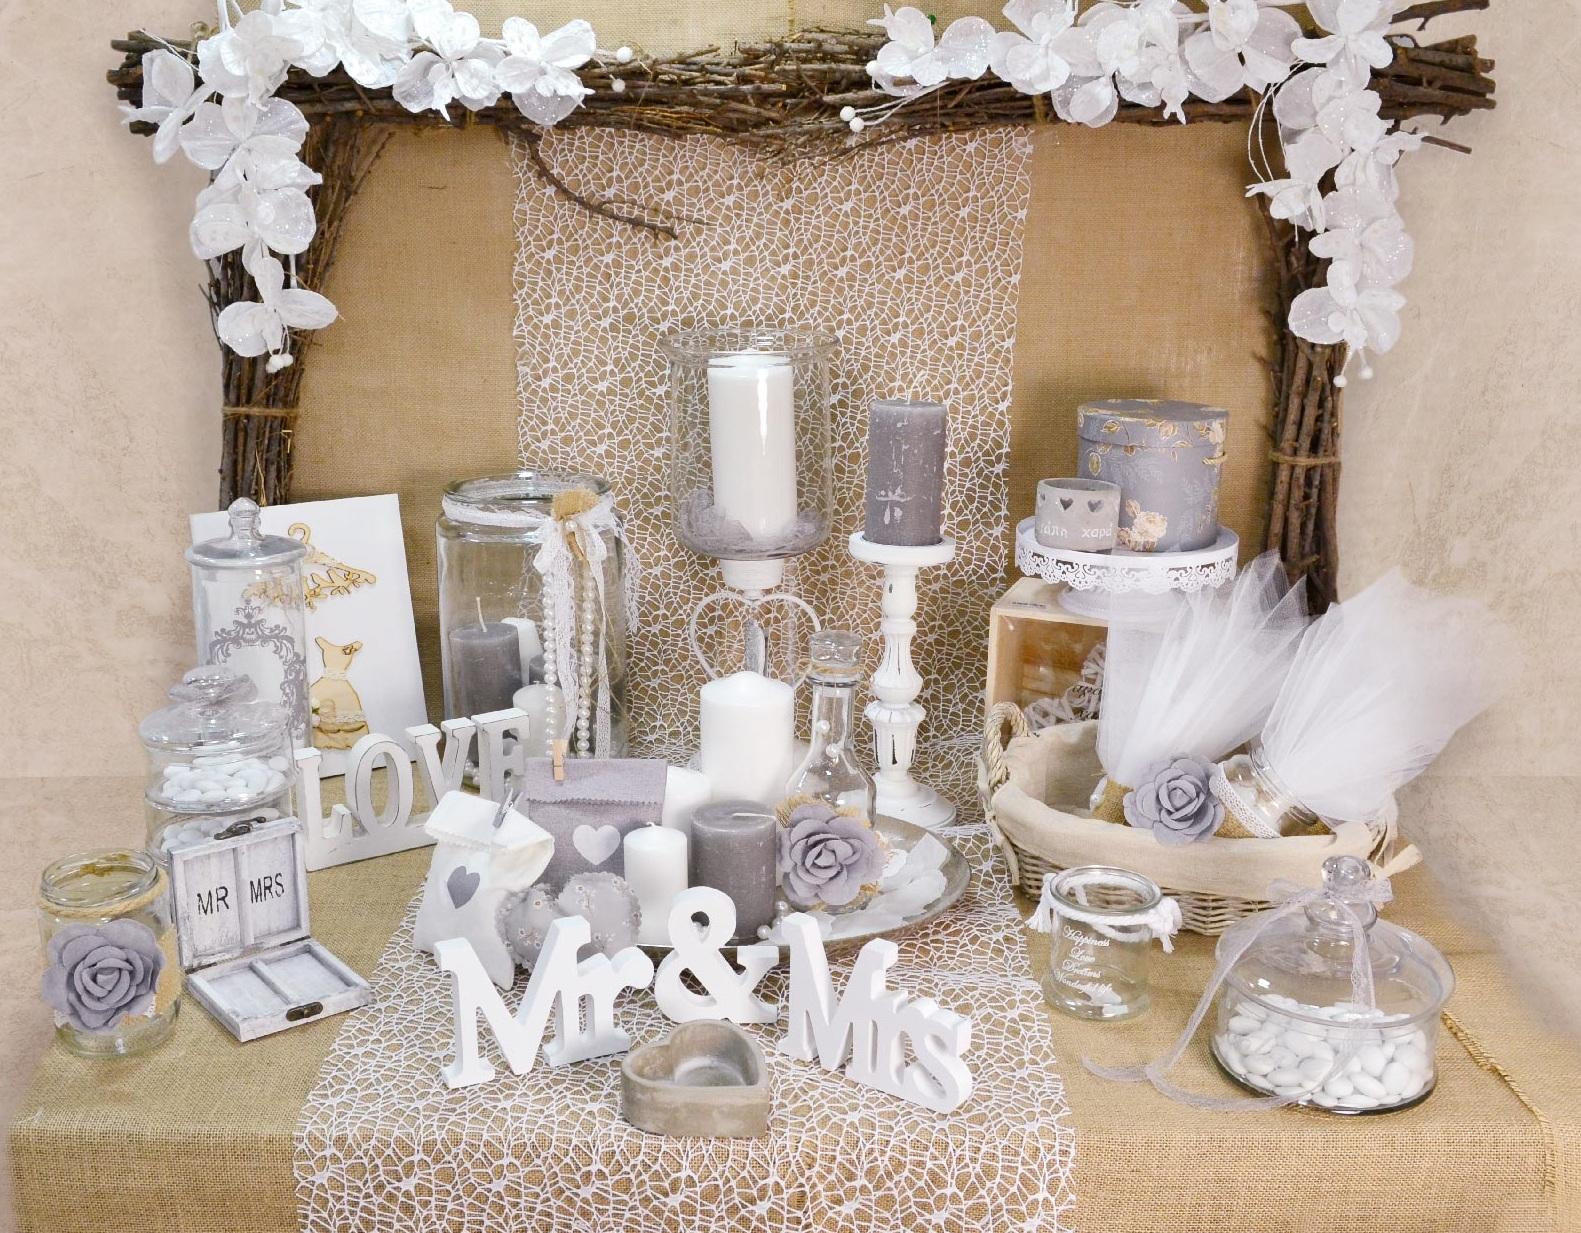 35e73edf1a16 Τραπέζι ευχών για Vintage γάμο σε αποχρώσεις λευκό και γκρι